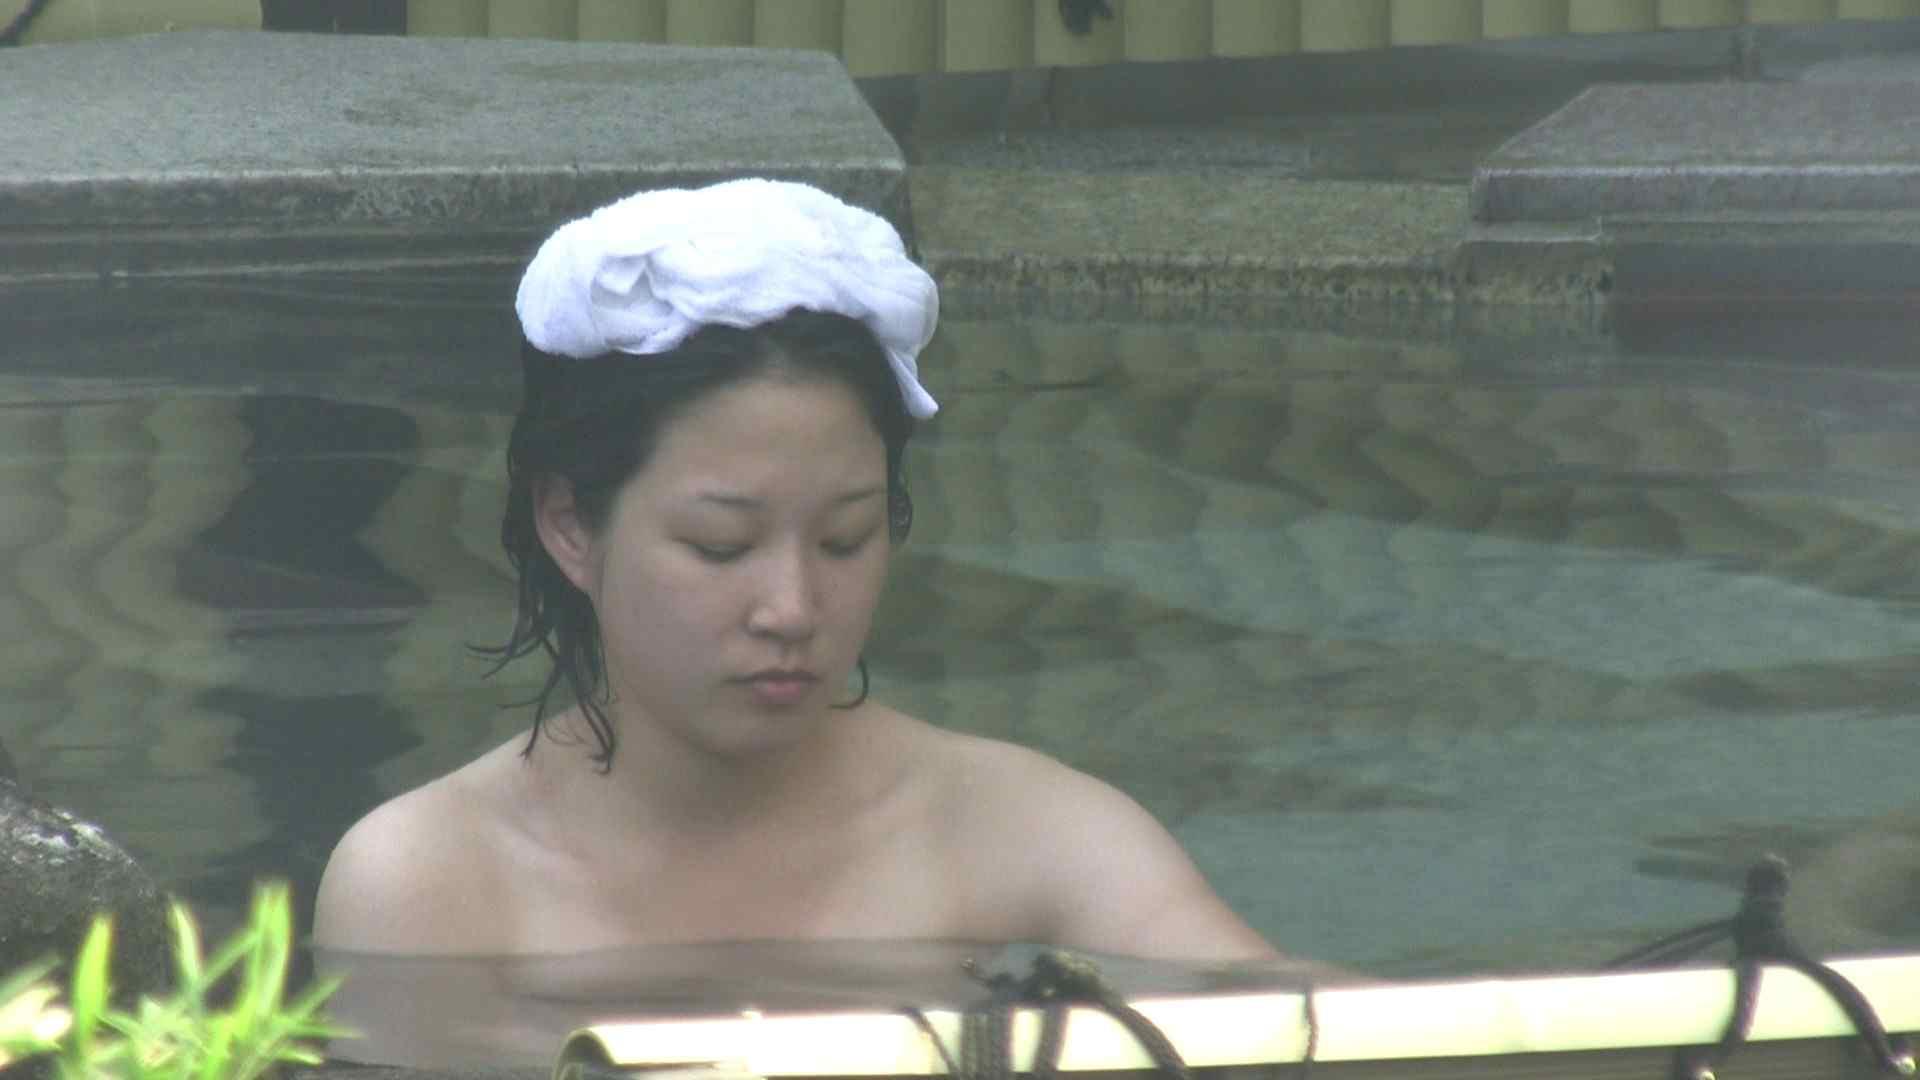 Aquaな露天風呂Vol.172 盗撮   HなOL  55pic 54